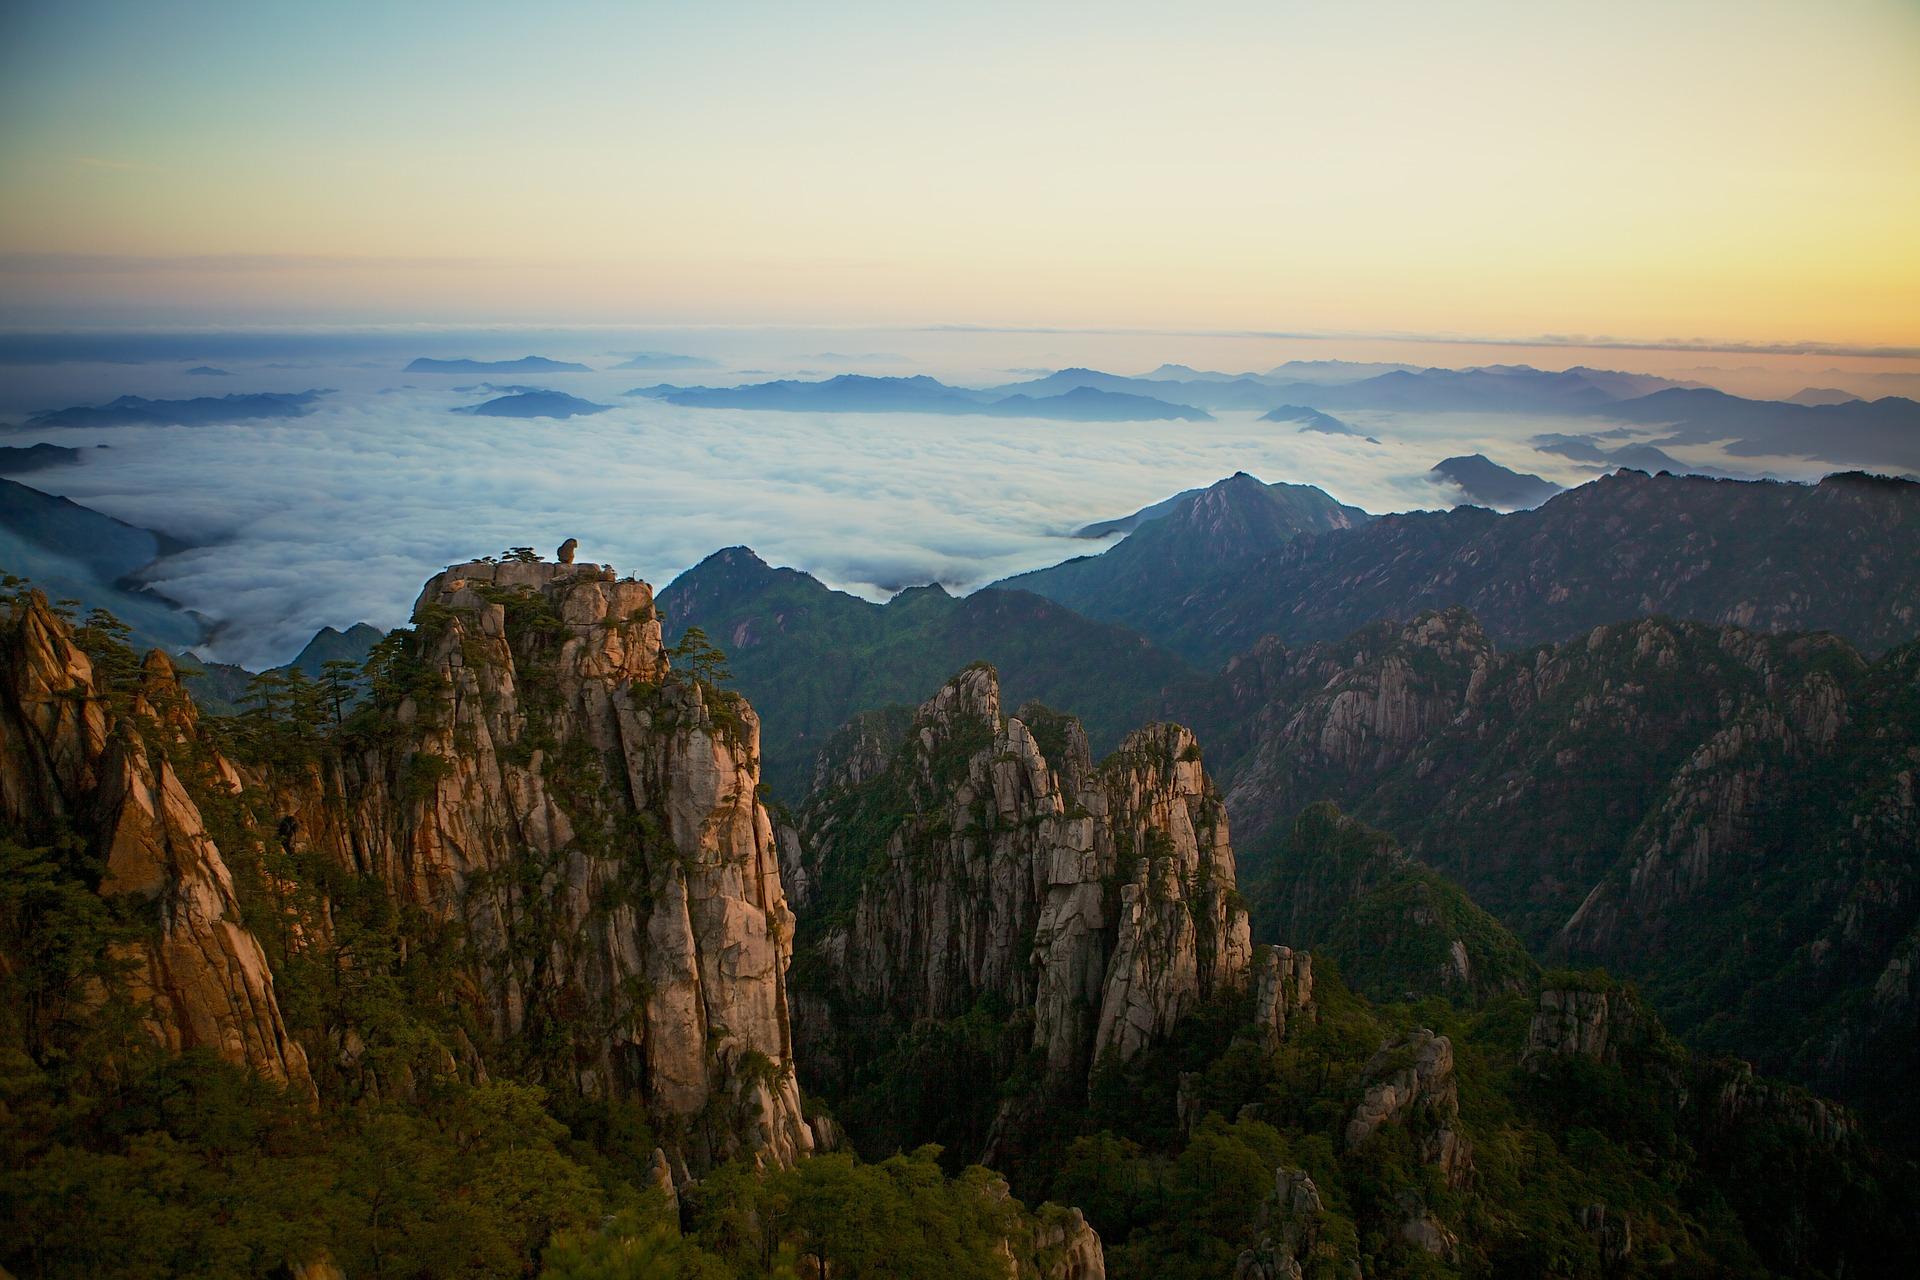 yellow-mountains-china.jpg